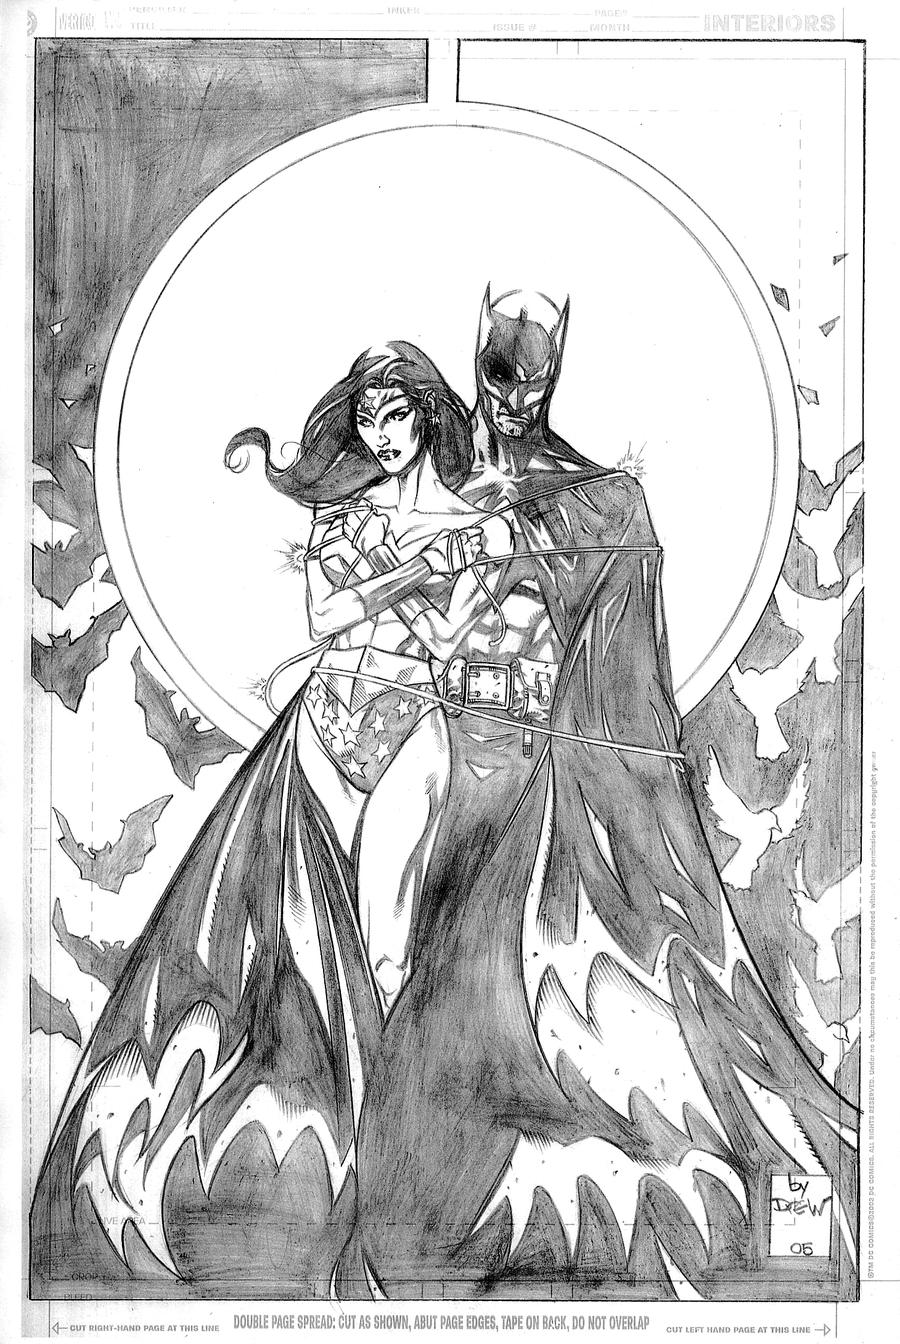 Coloring pages wonder woman - Batman_and_wonder_woman_by_drewjohnson